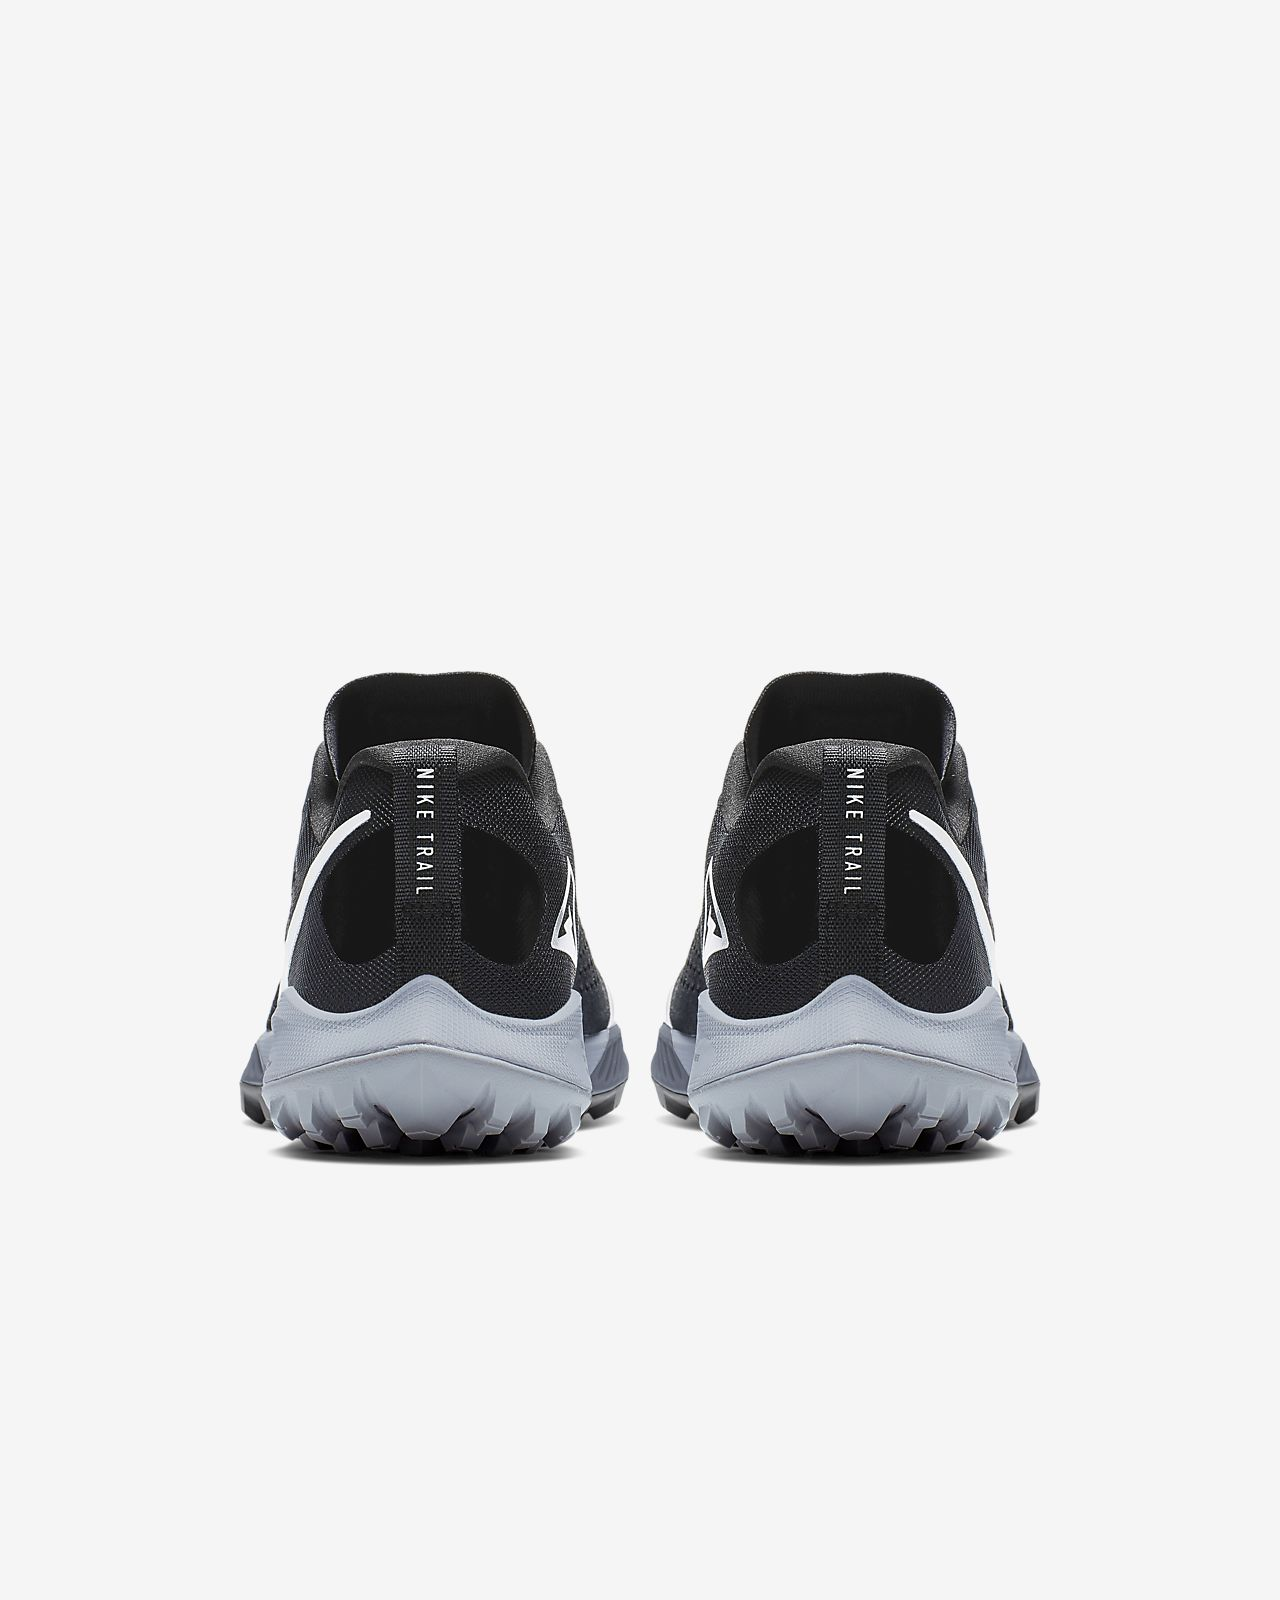 336d01099026a Nike Air Zoom Terra Kiger 5 Women s Running Shoe. Nike.com